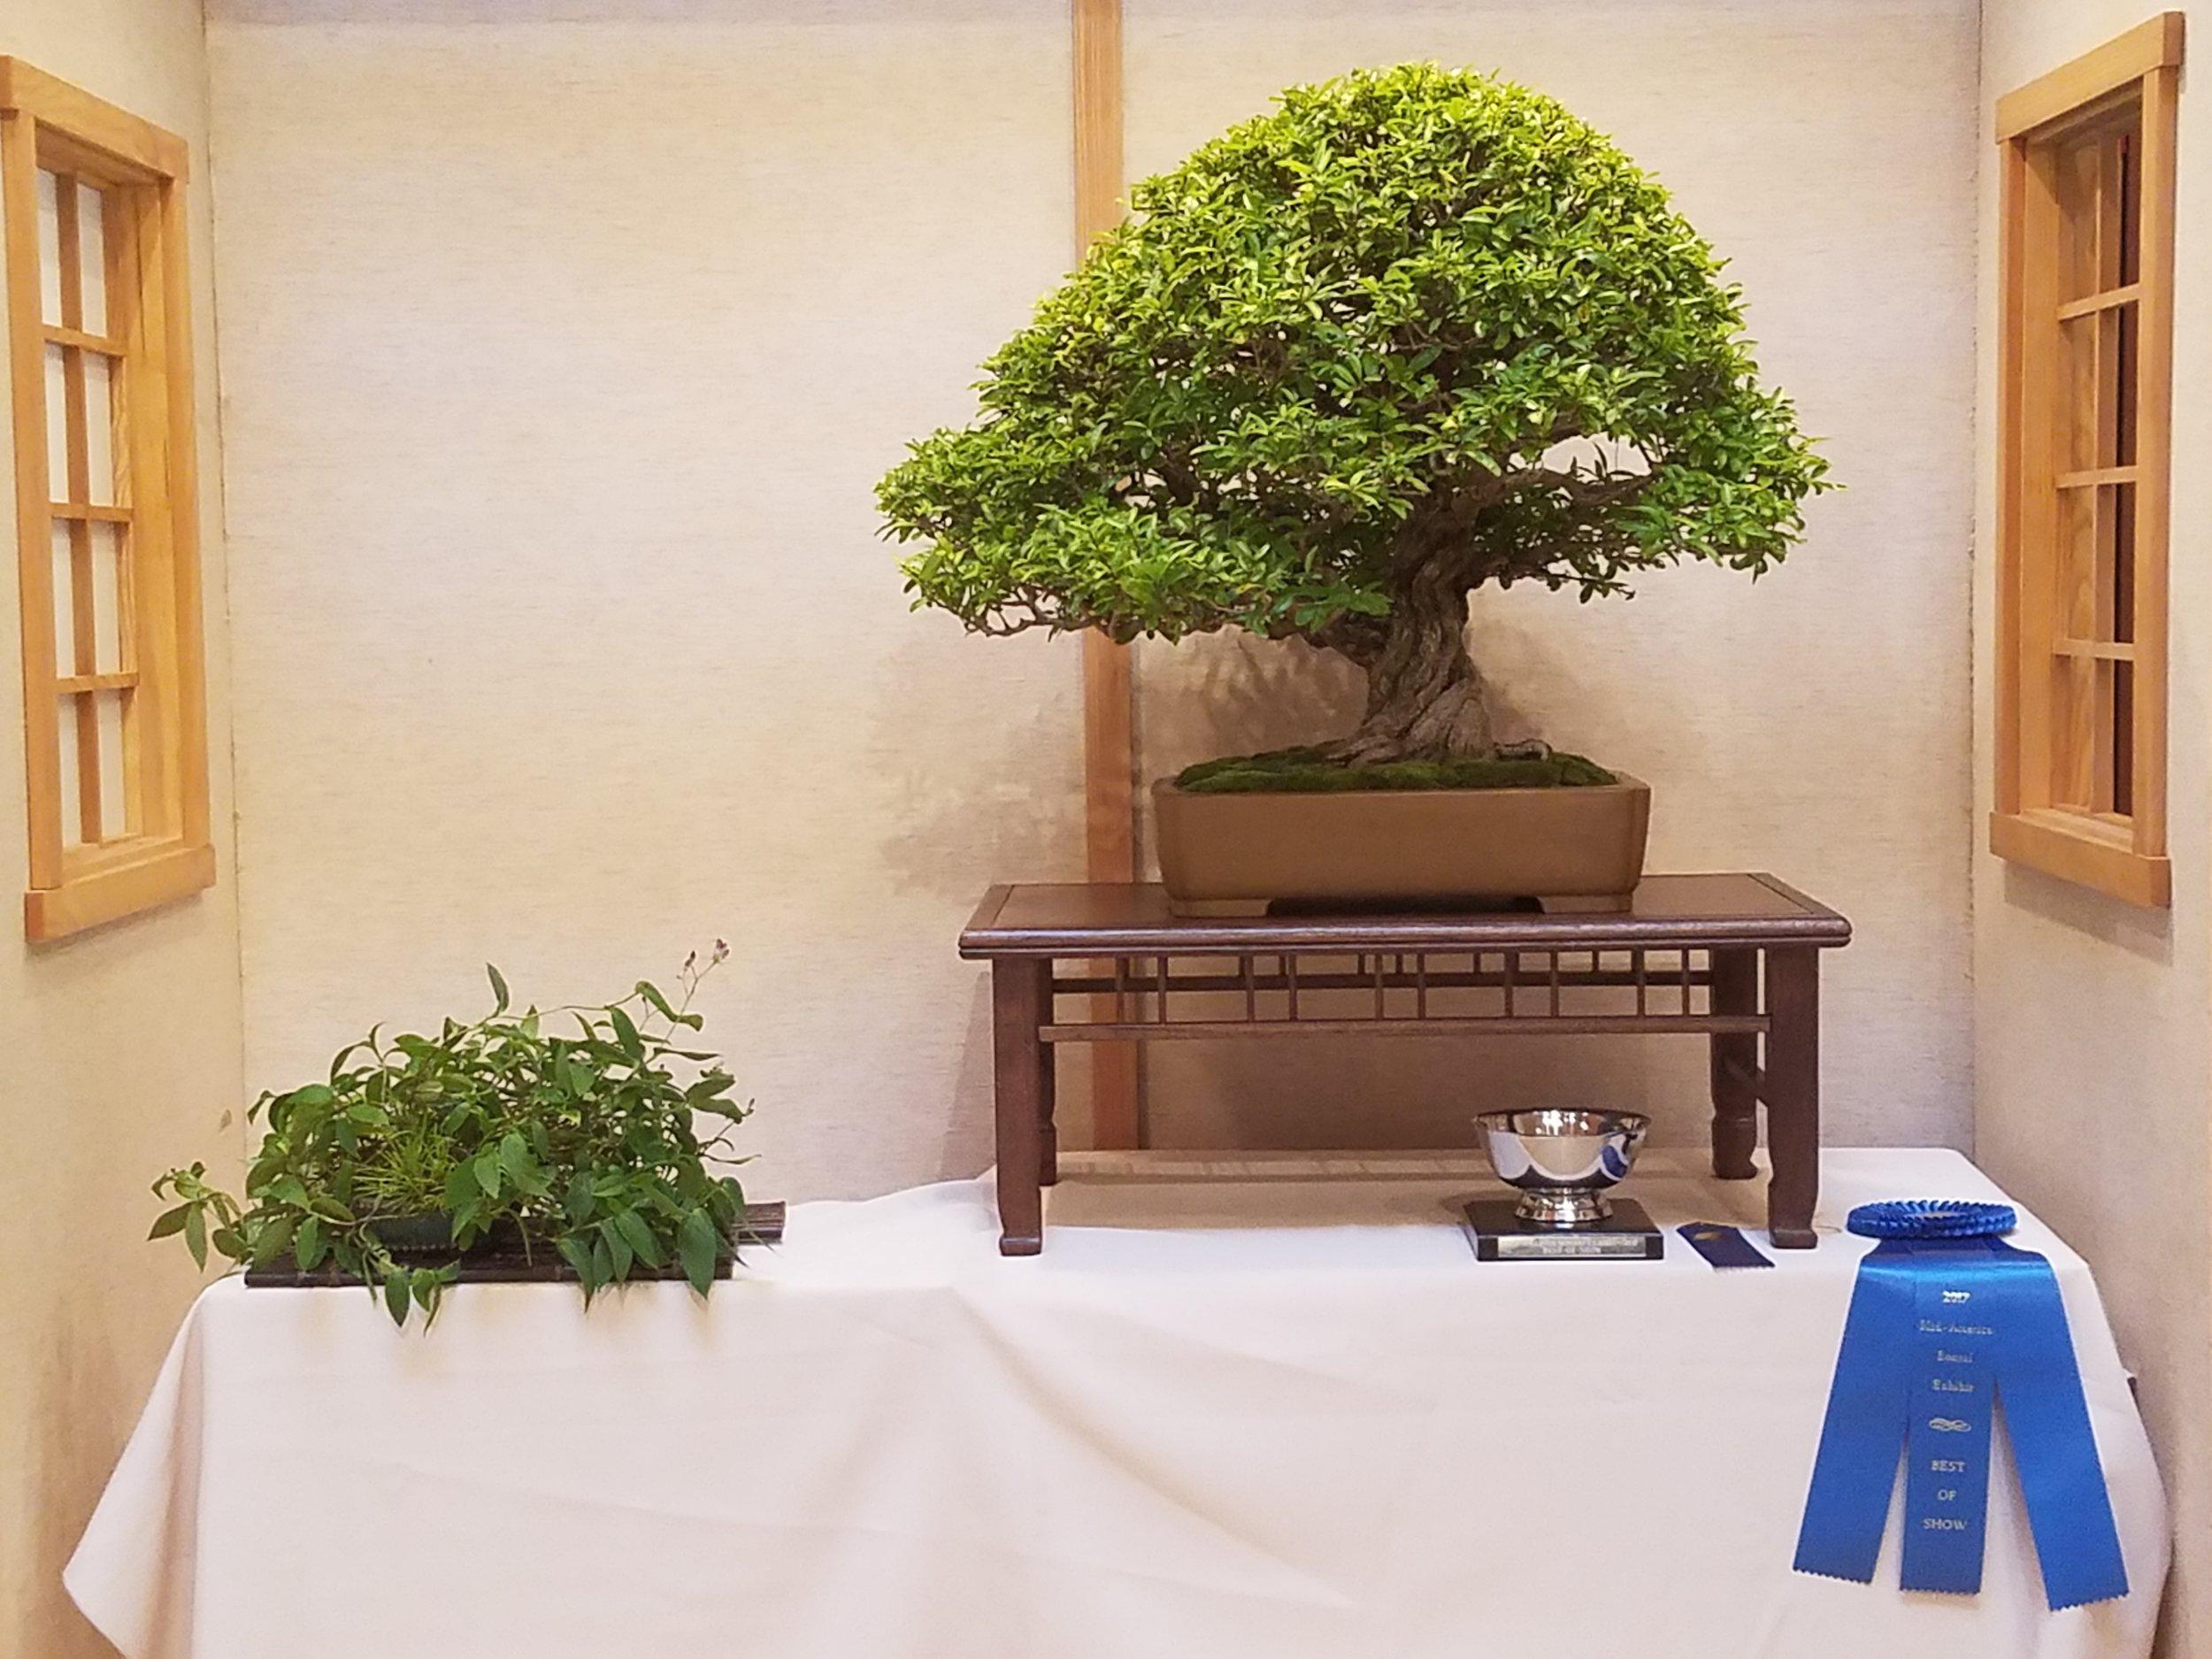 2017 Mid-America Bonsai Exhibition - Pomegranate - Informal Upright